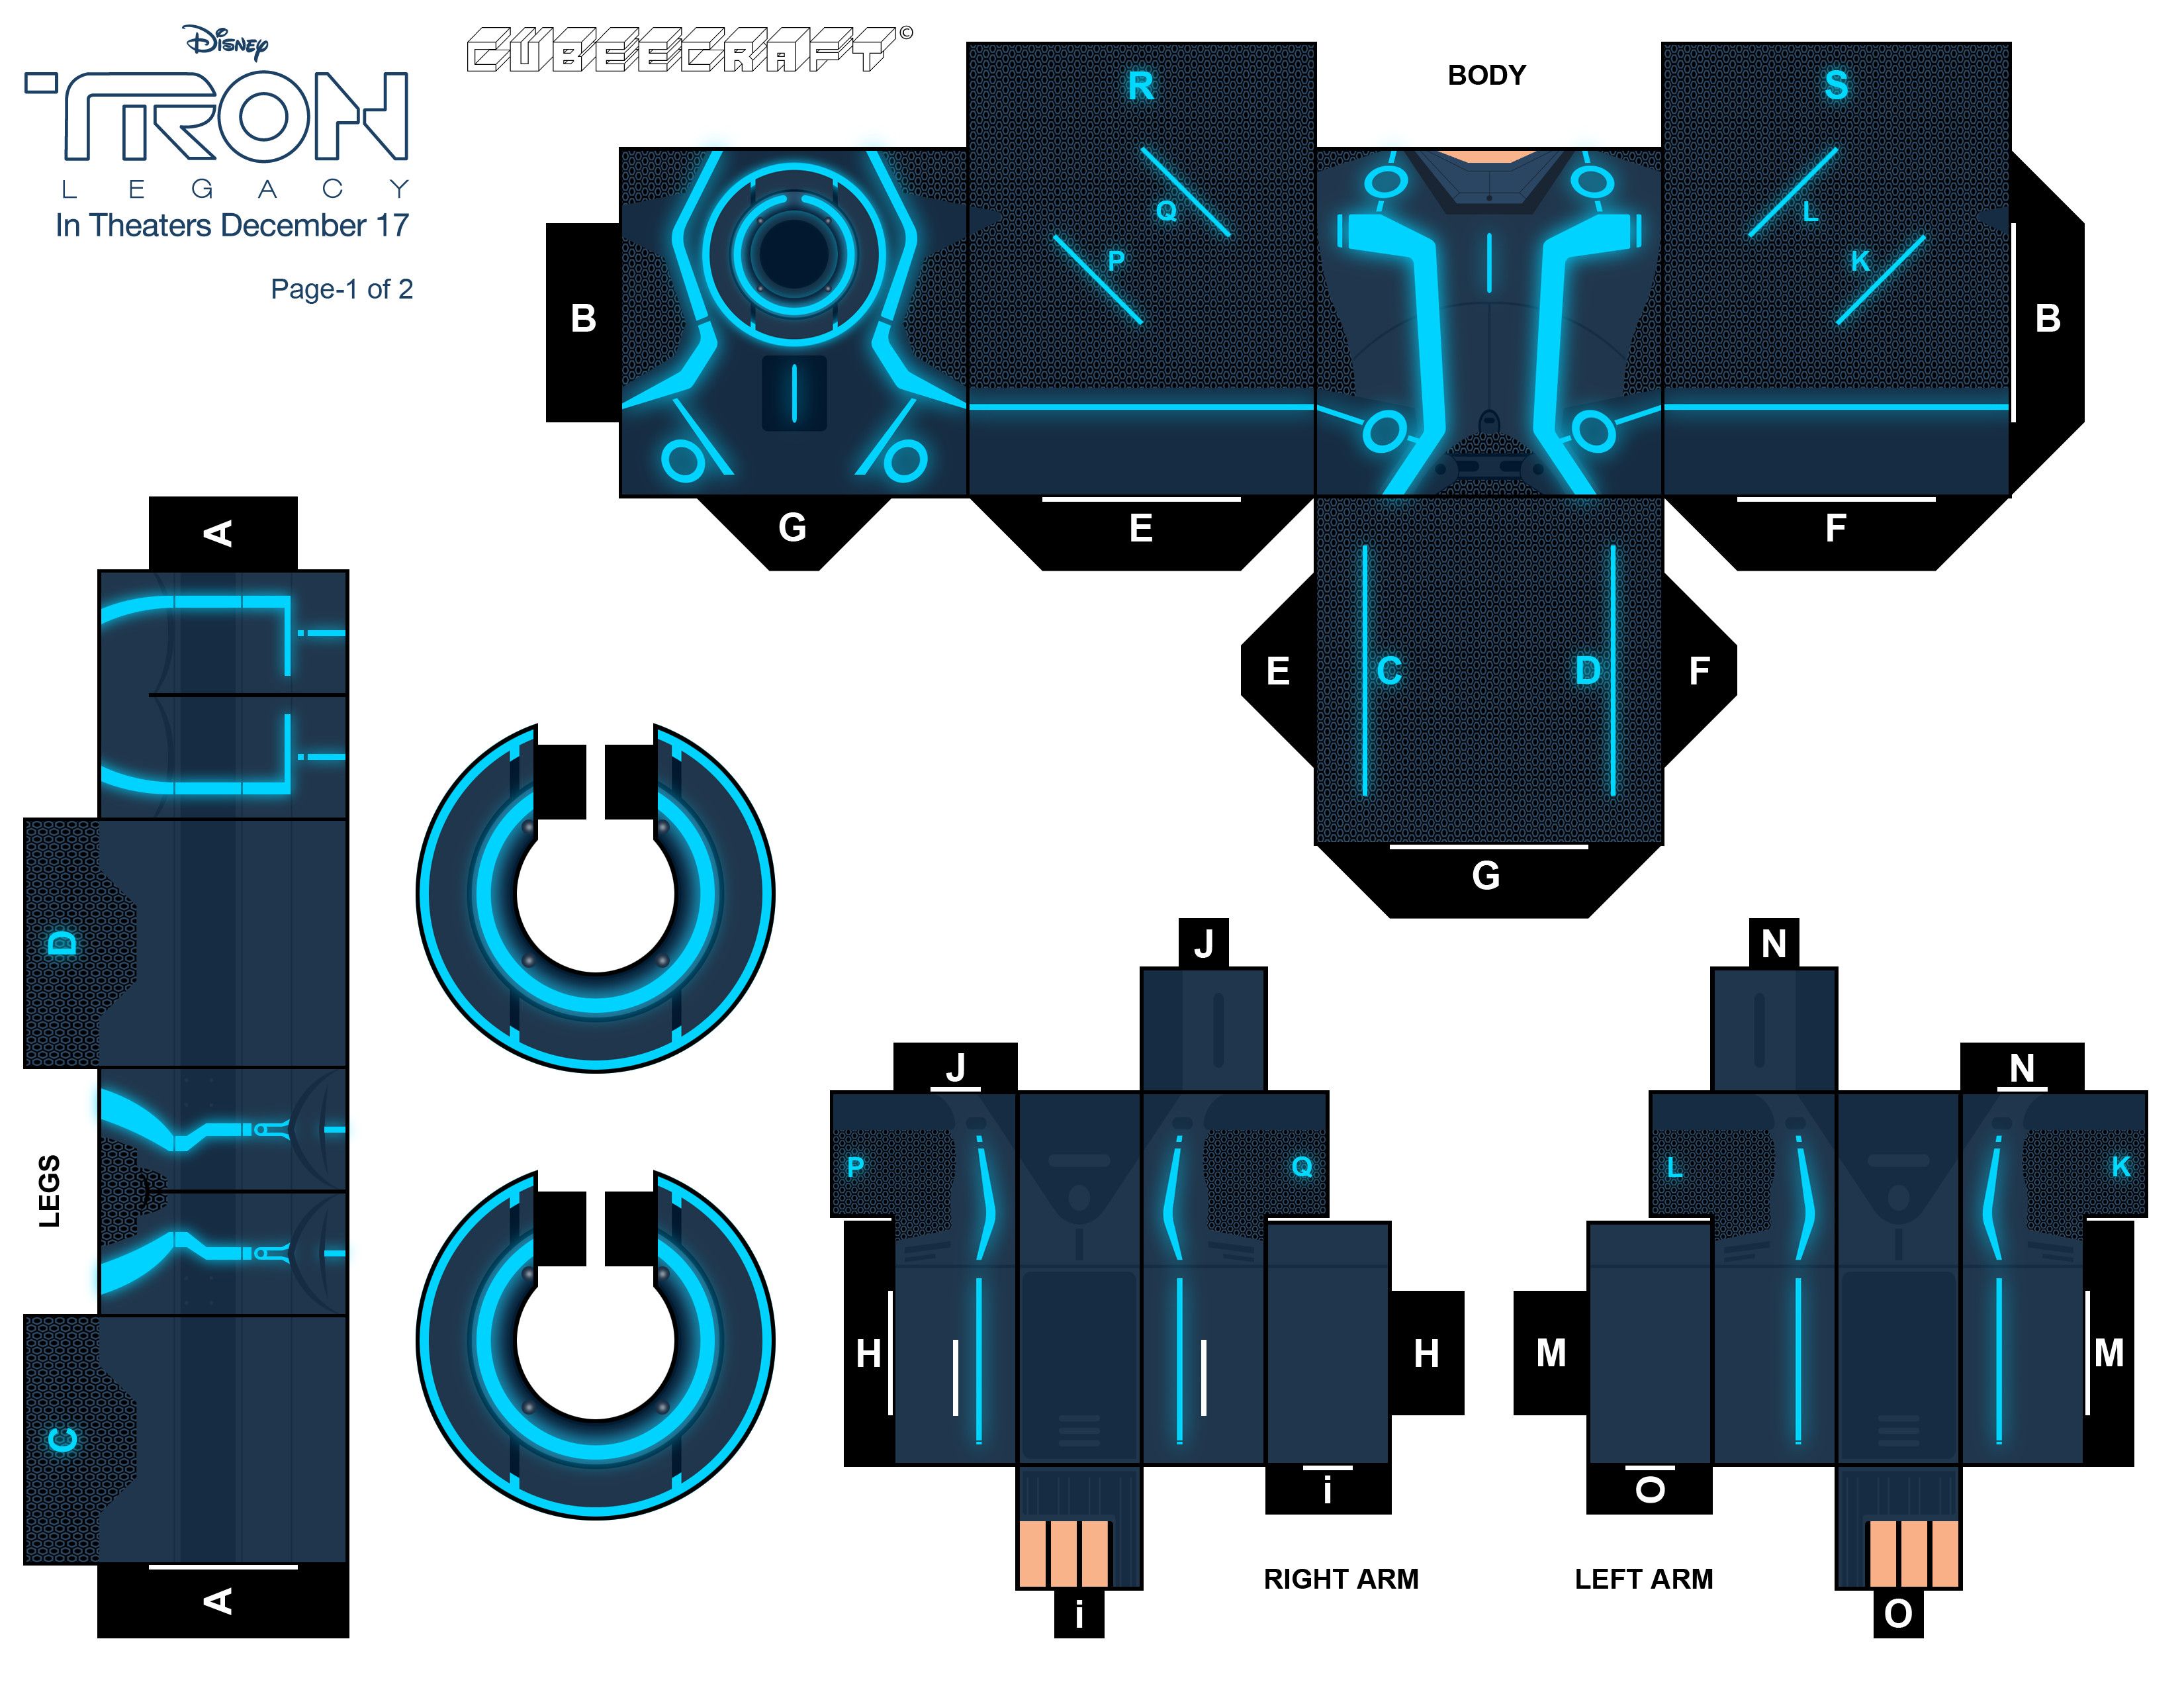 XL Tron Legacy Cubee pt1 by randyfivesix